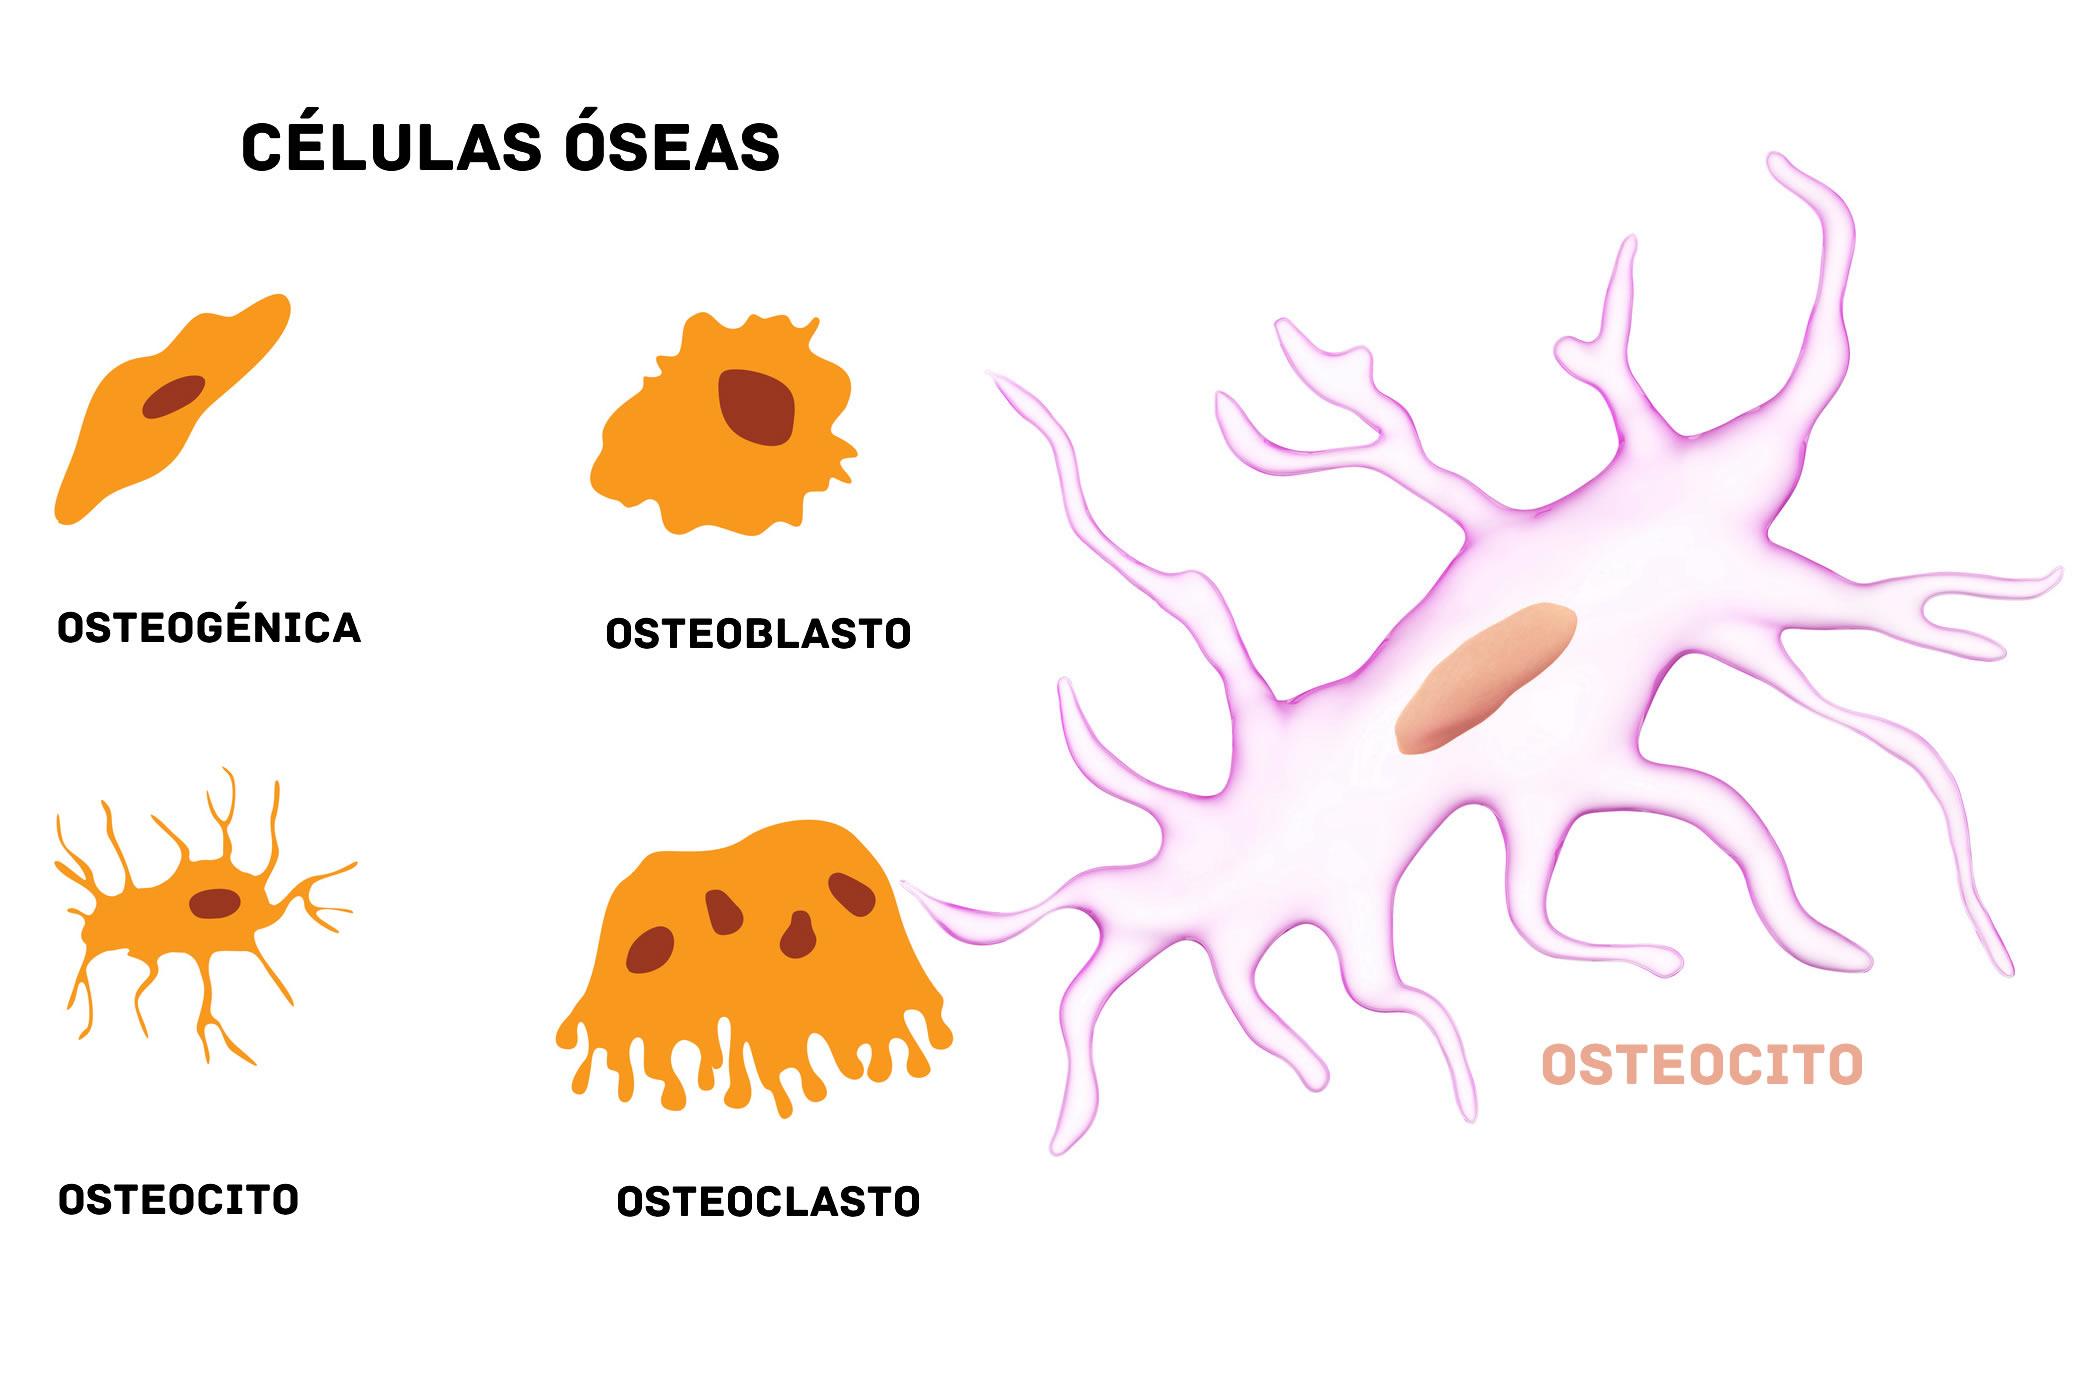 Osteocito